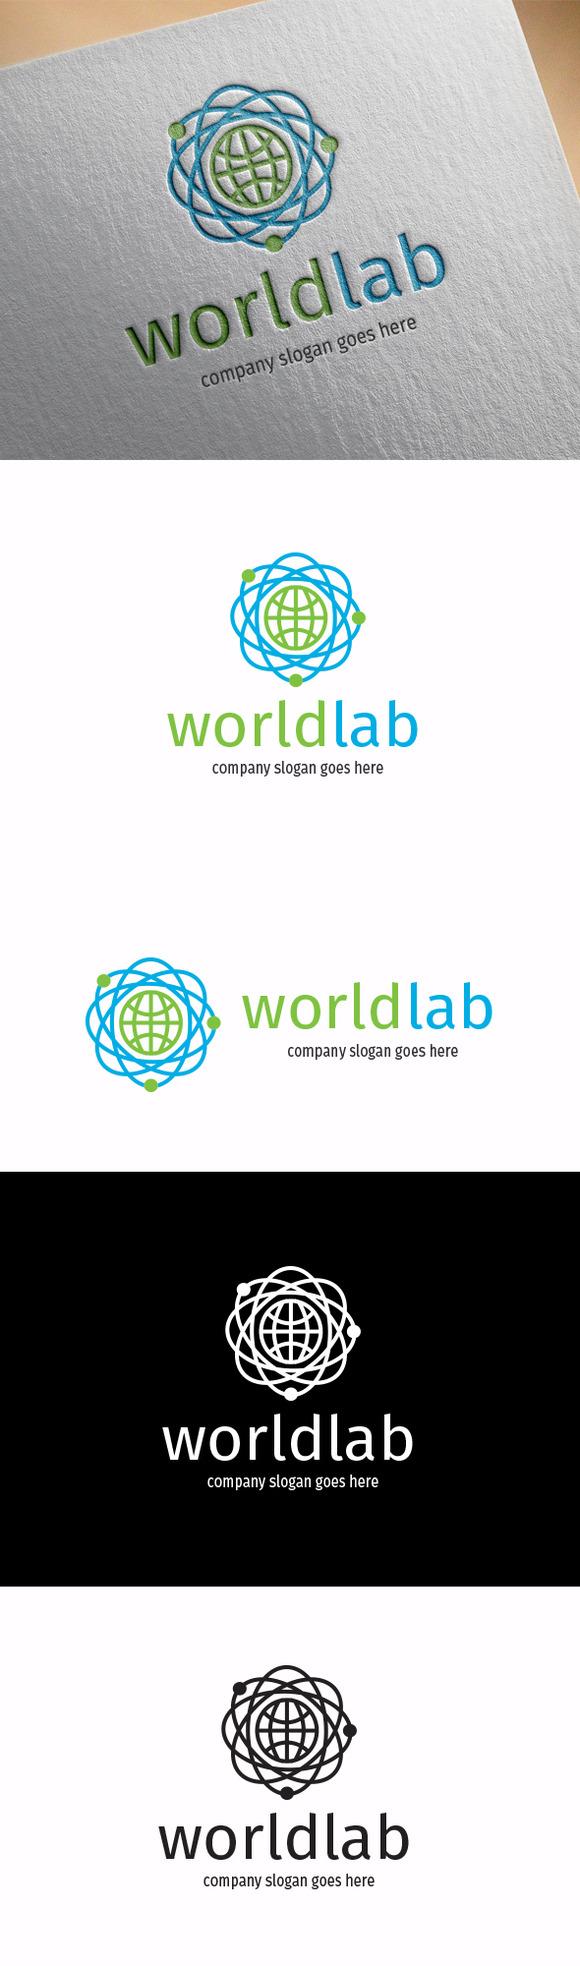 Worldlab Logo